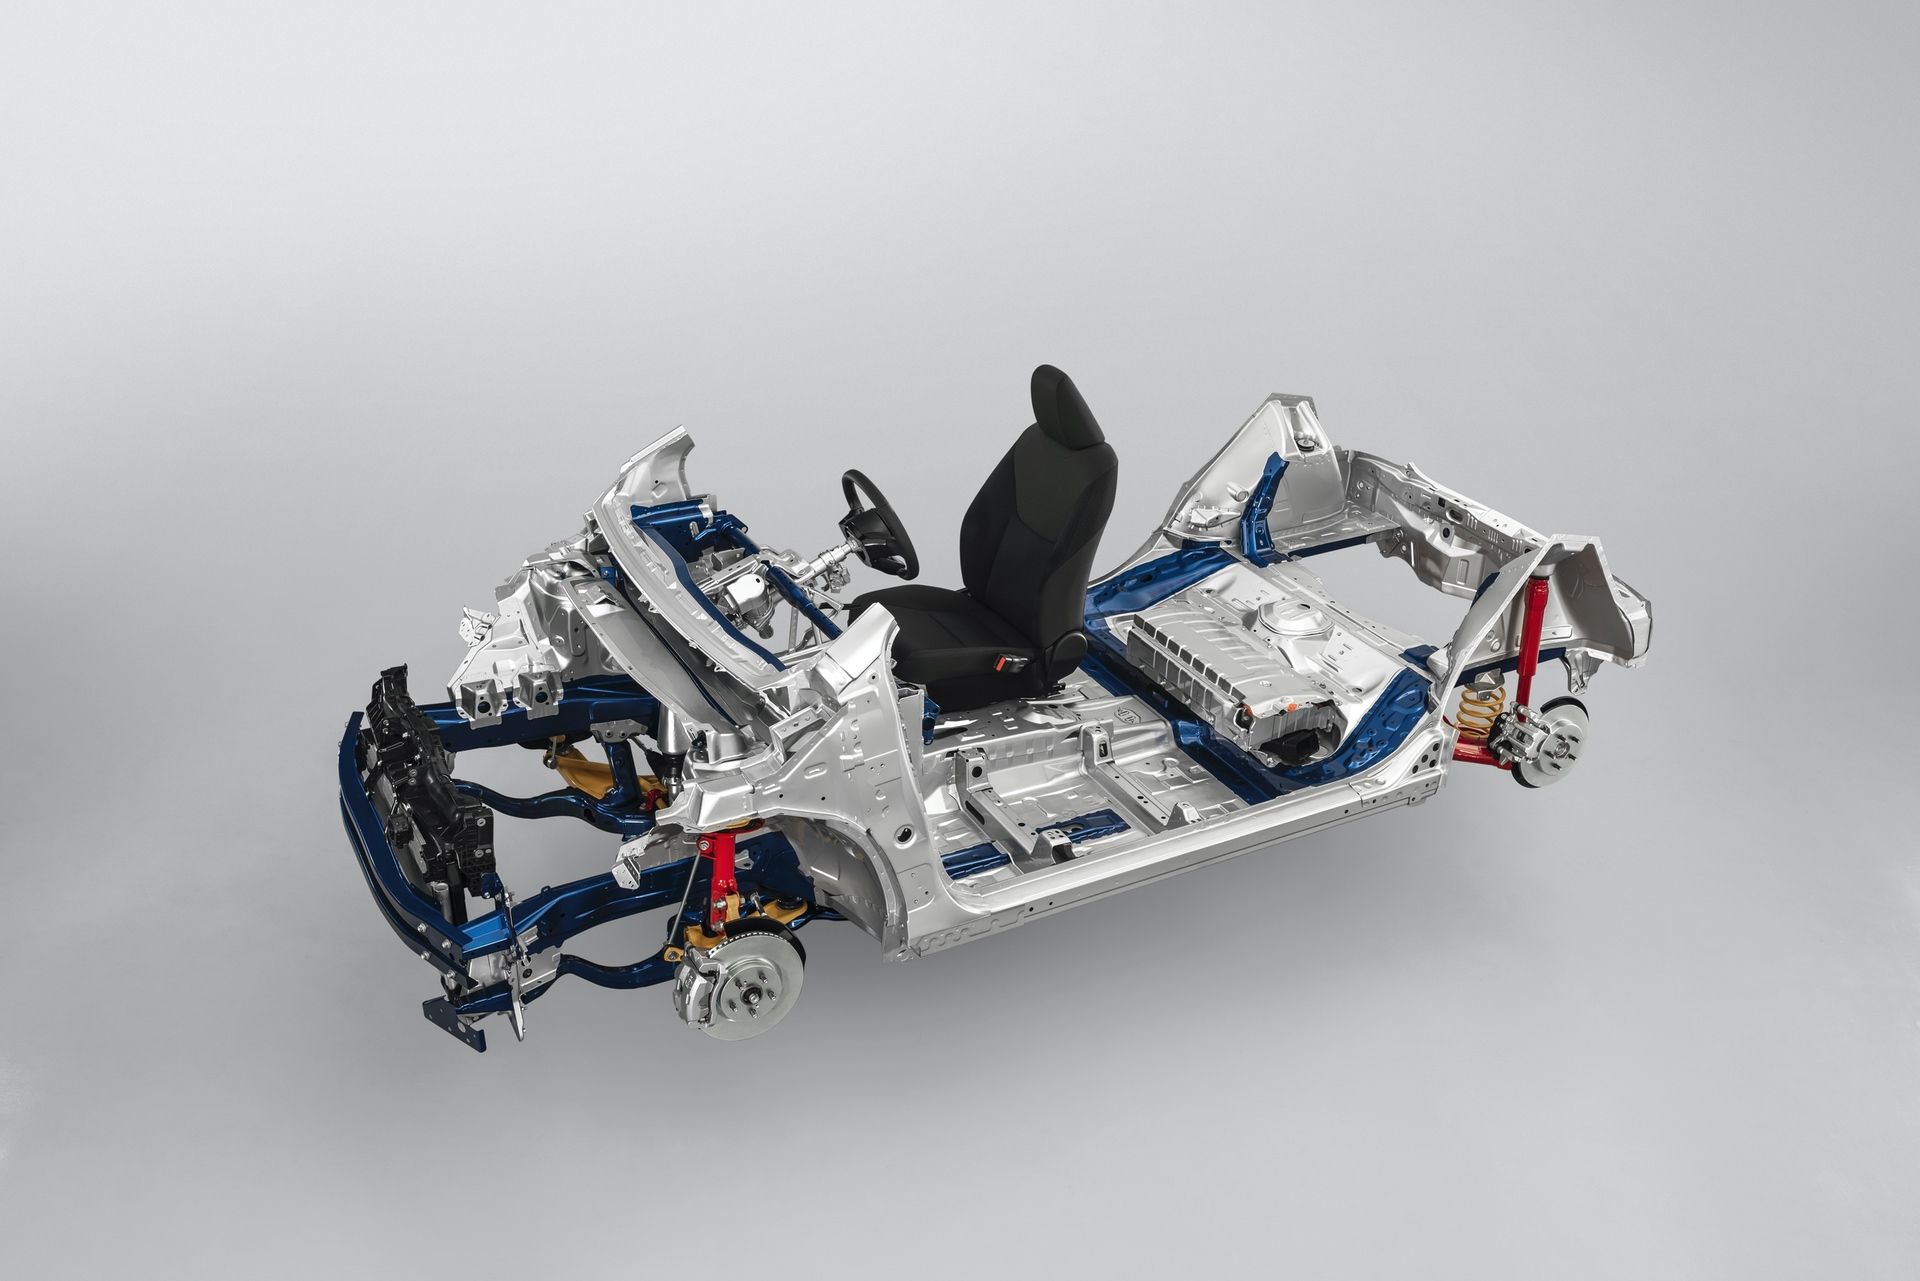 tnga-009-396150